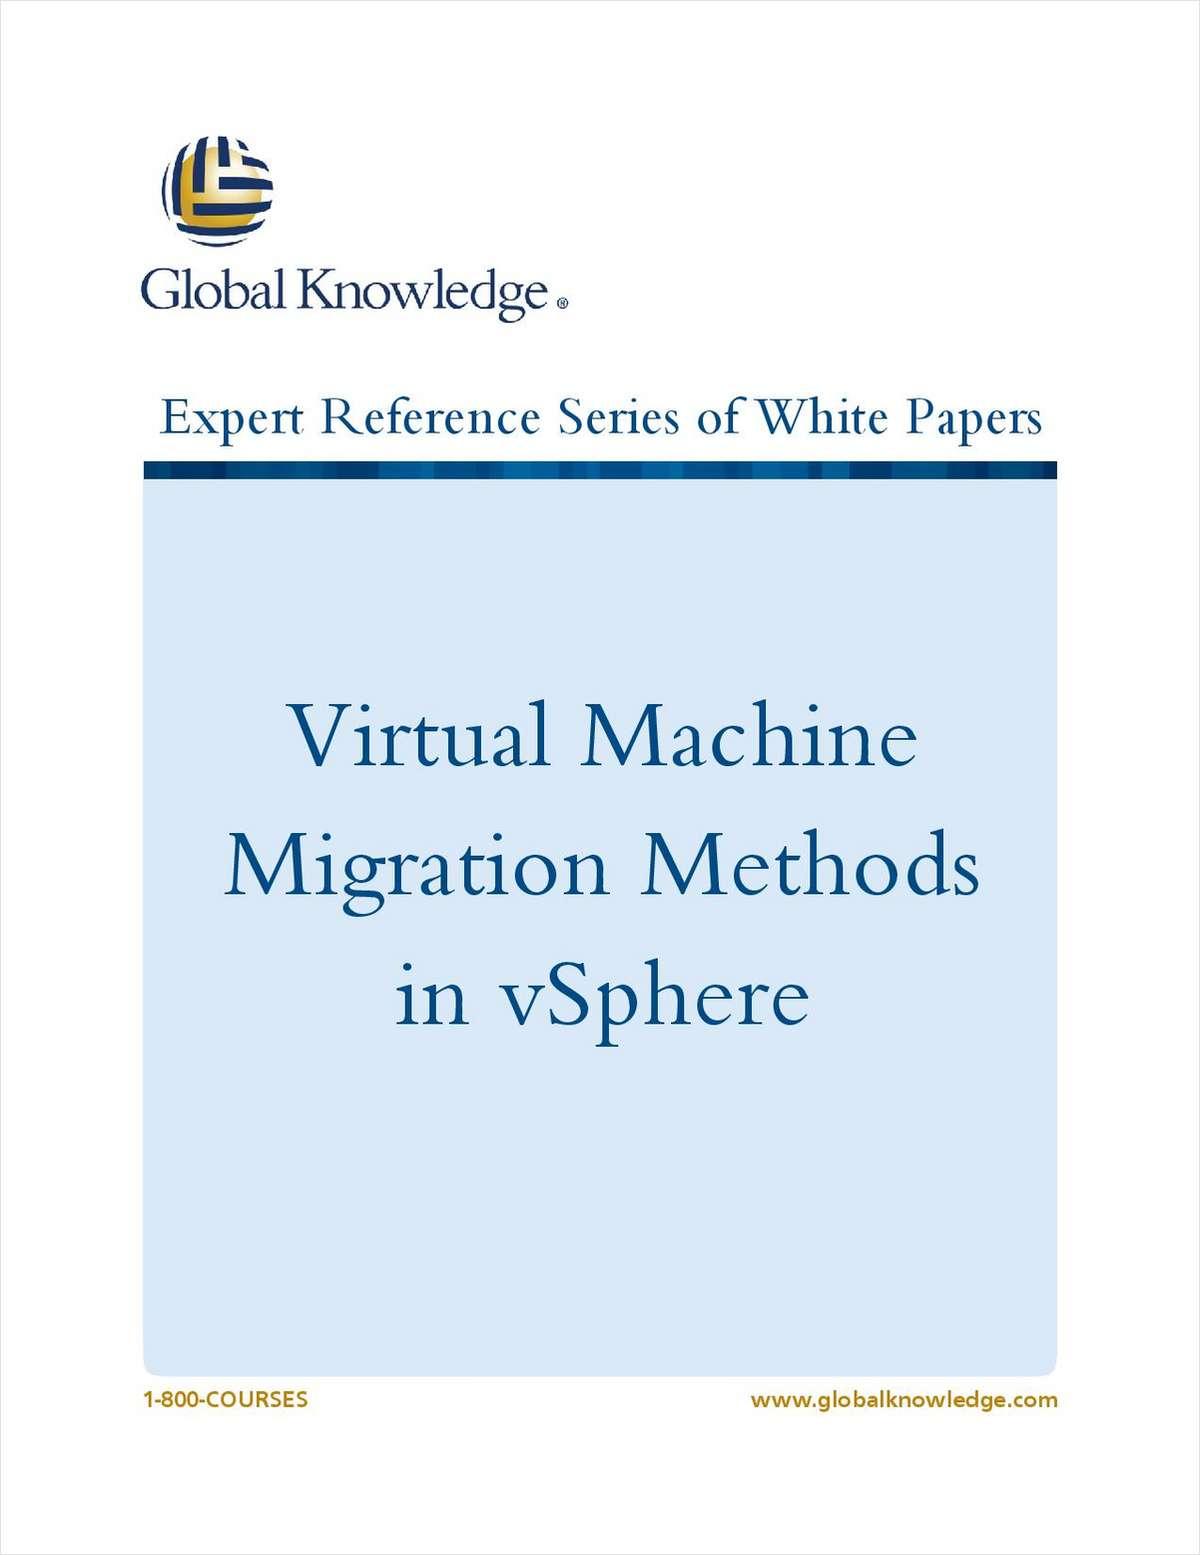 Virtual Machine Migration Methods in vSphere